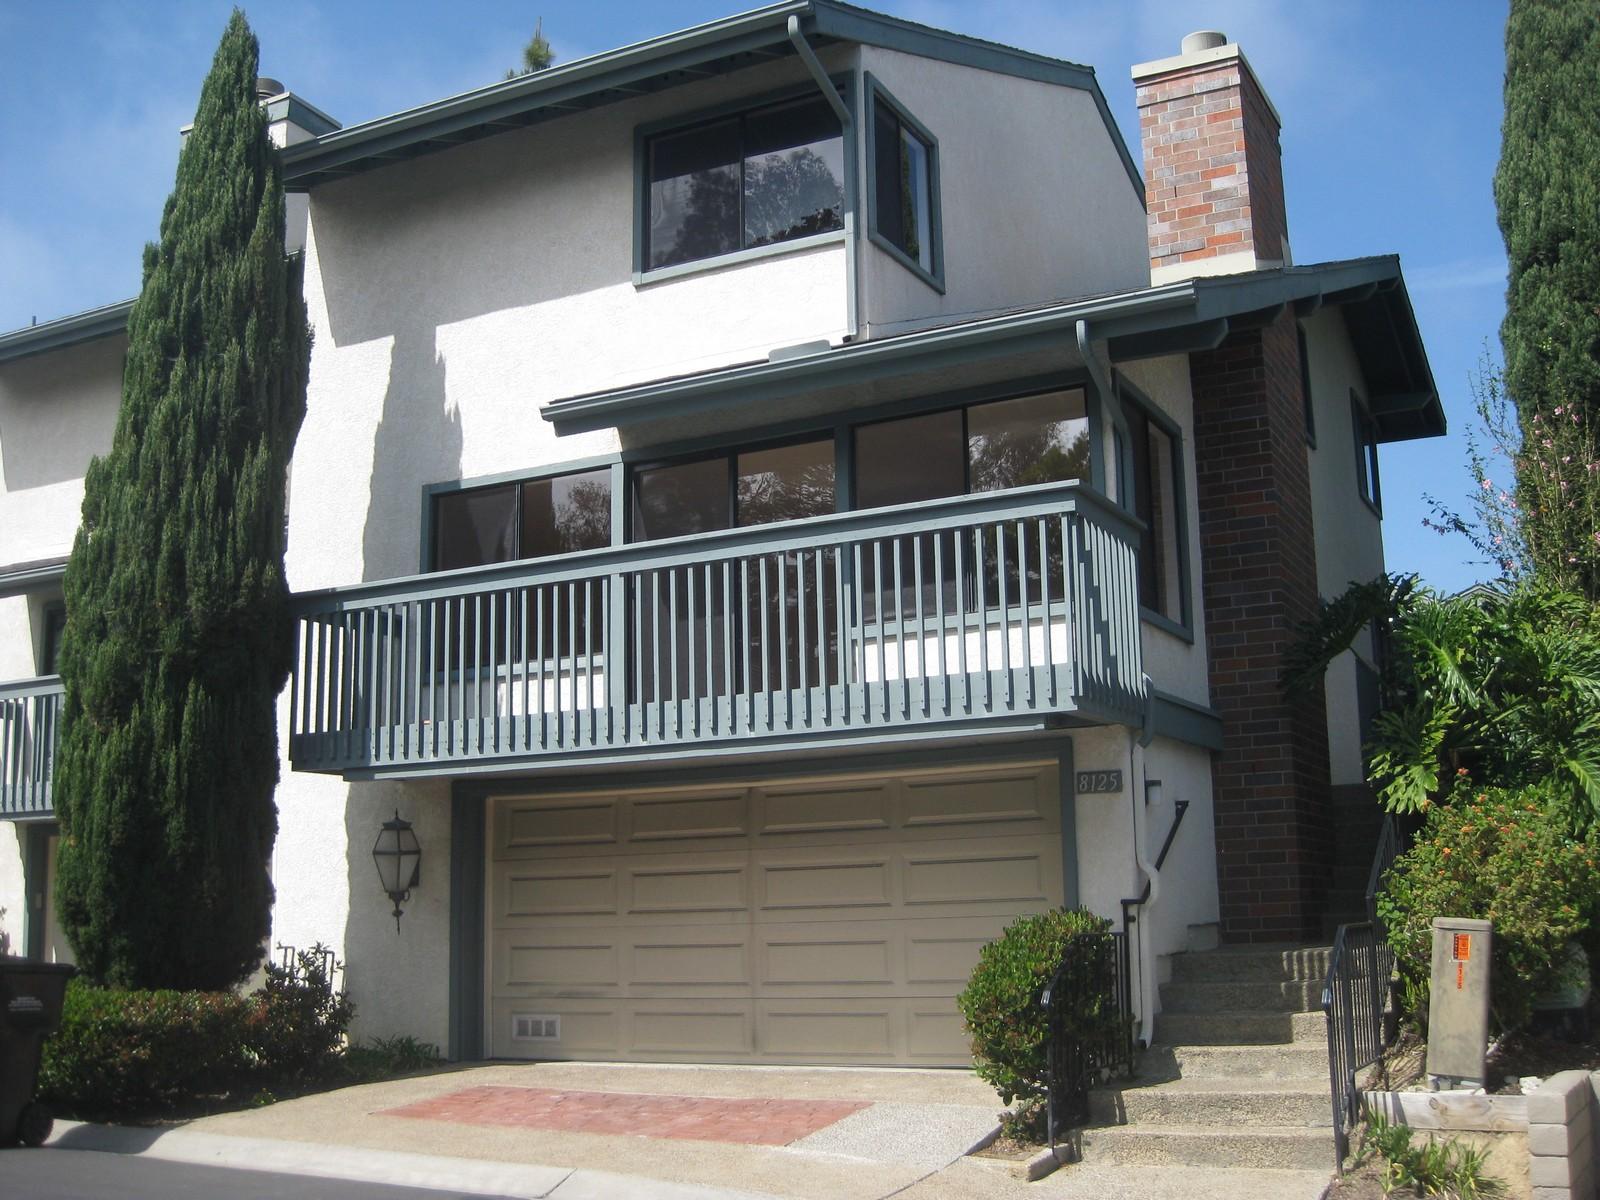 Casa Unifamiliar Adosada por un Venta en 8125 Caminito Mallorca La Jolla, California 92037 Estados Unidos